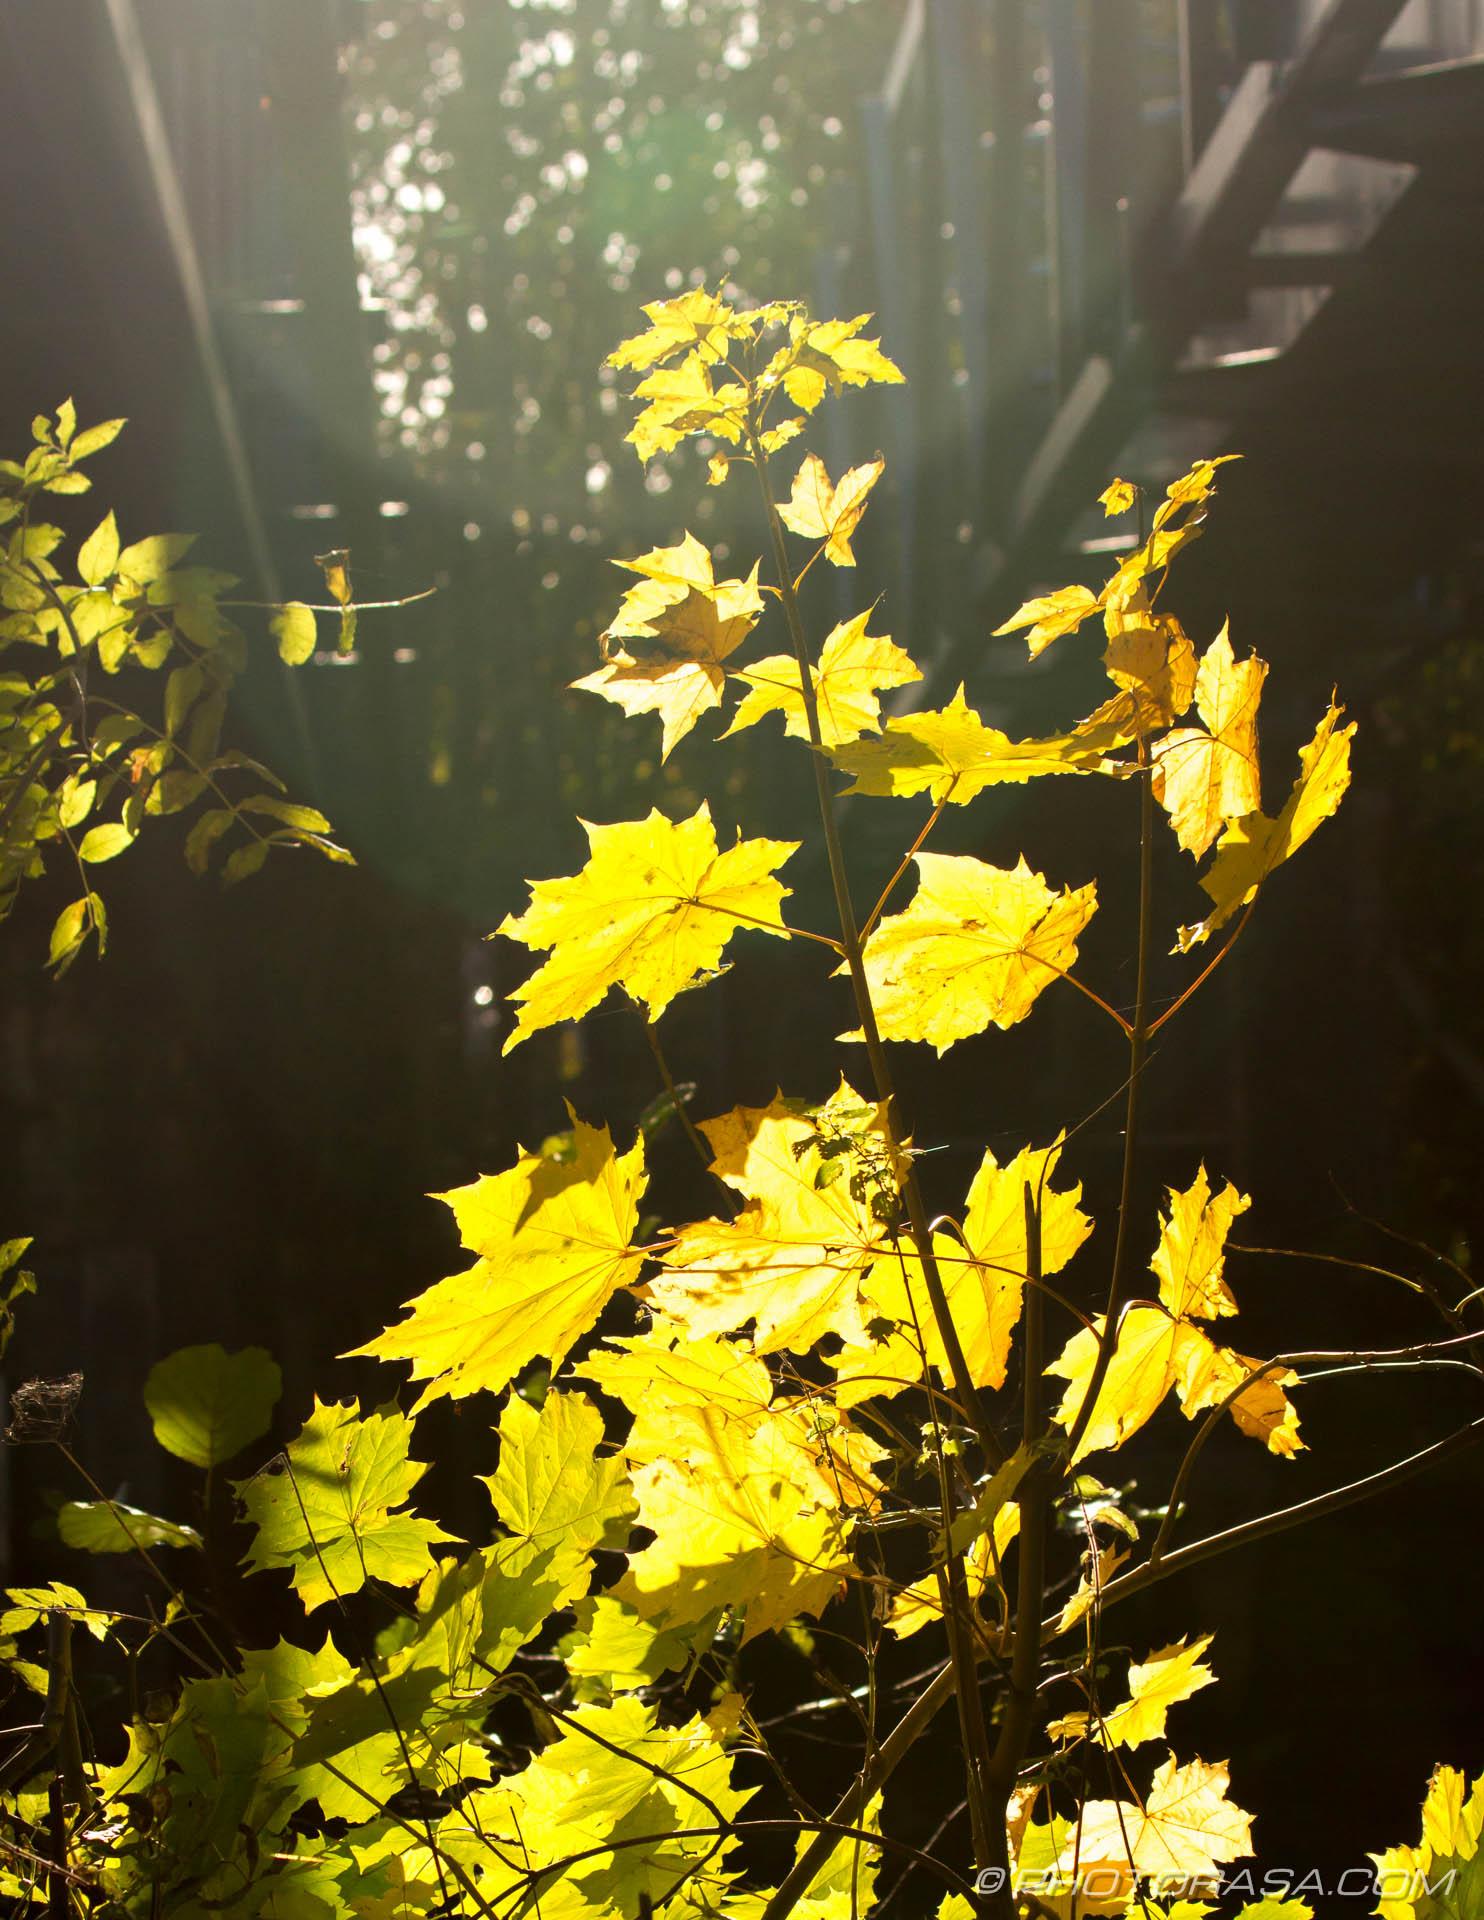 http://photorasa.com/autumn-leaves-sunlight/sunlight-on-yellow-leaves/